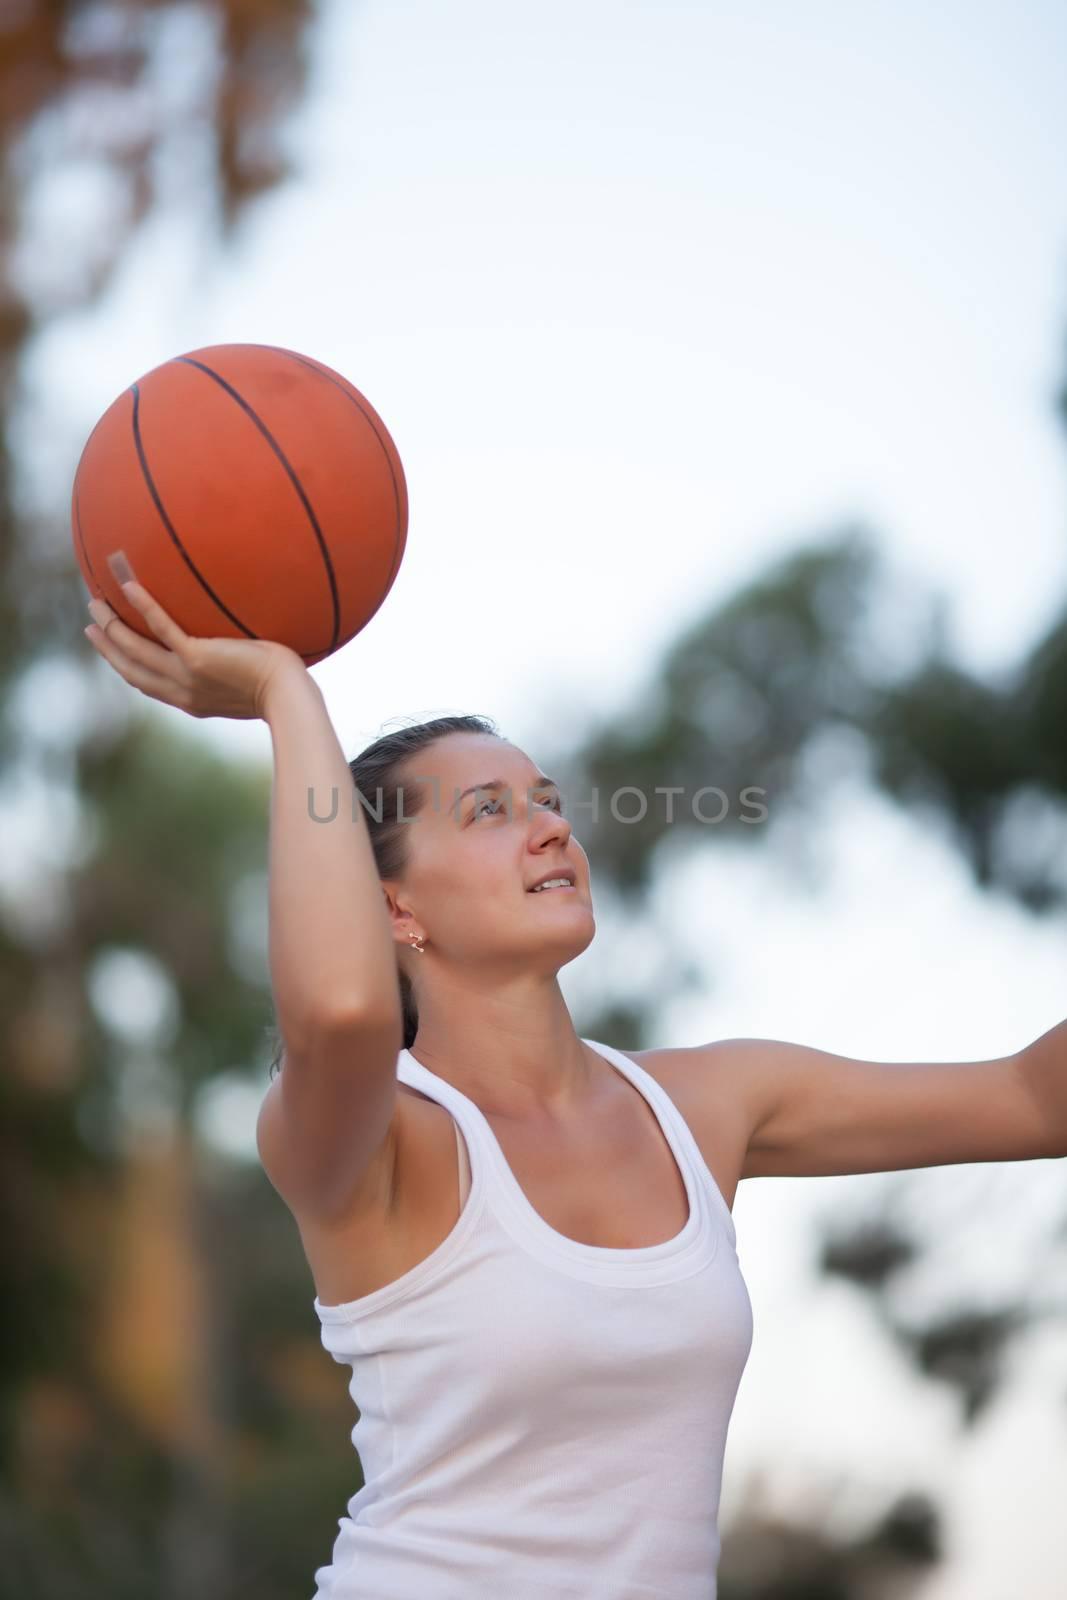 girl plays basketball, a healthy lifestyle